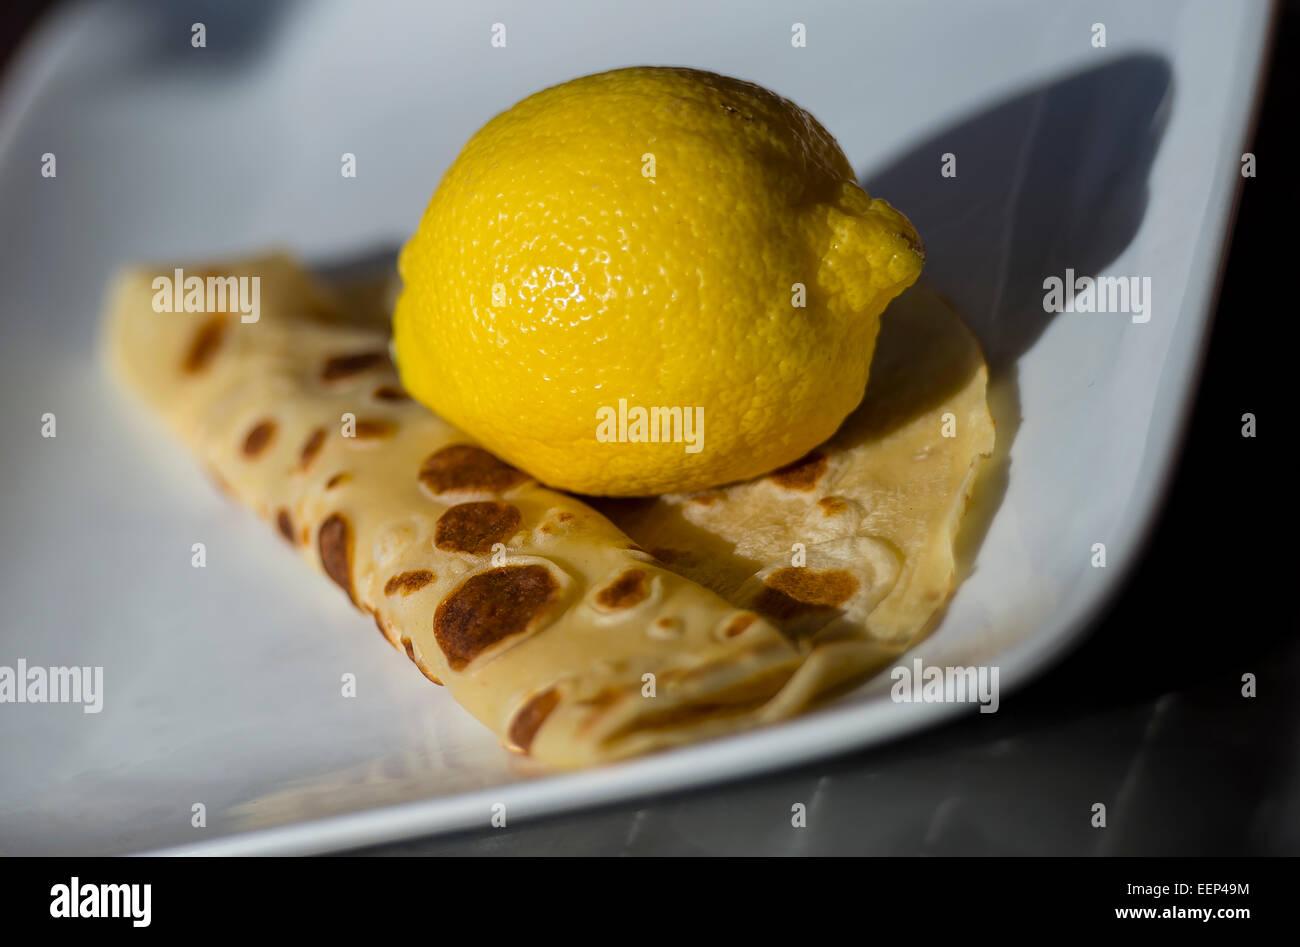 Pancake on a plate with a lemon. A popular pancake is lemon and sugar - Stock Image